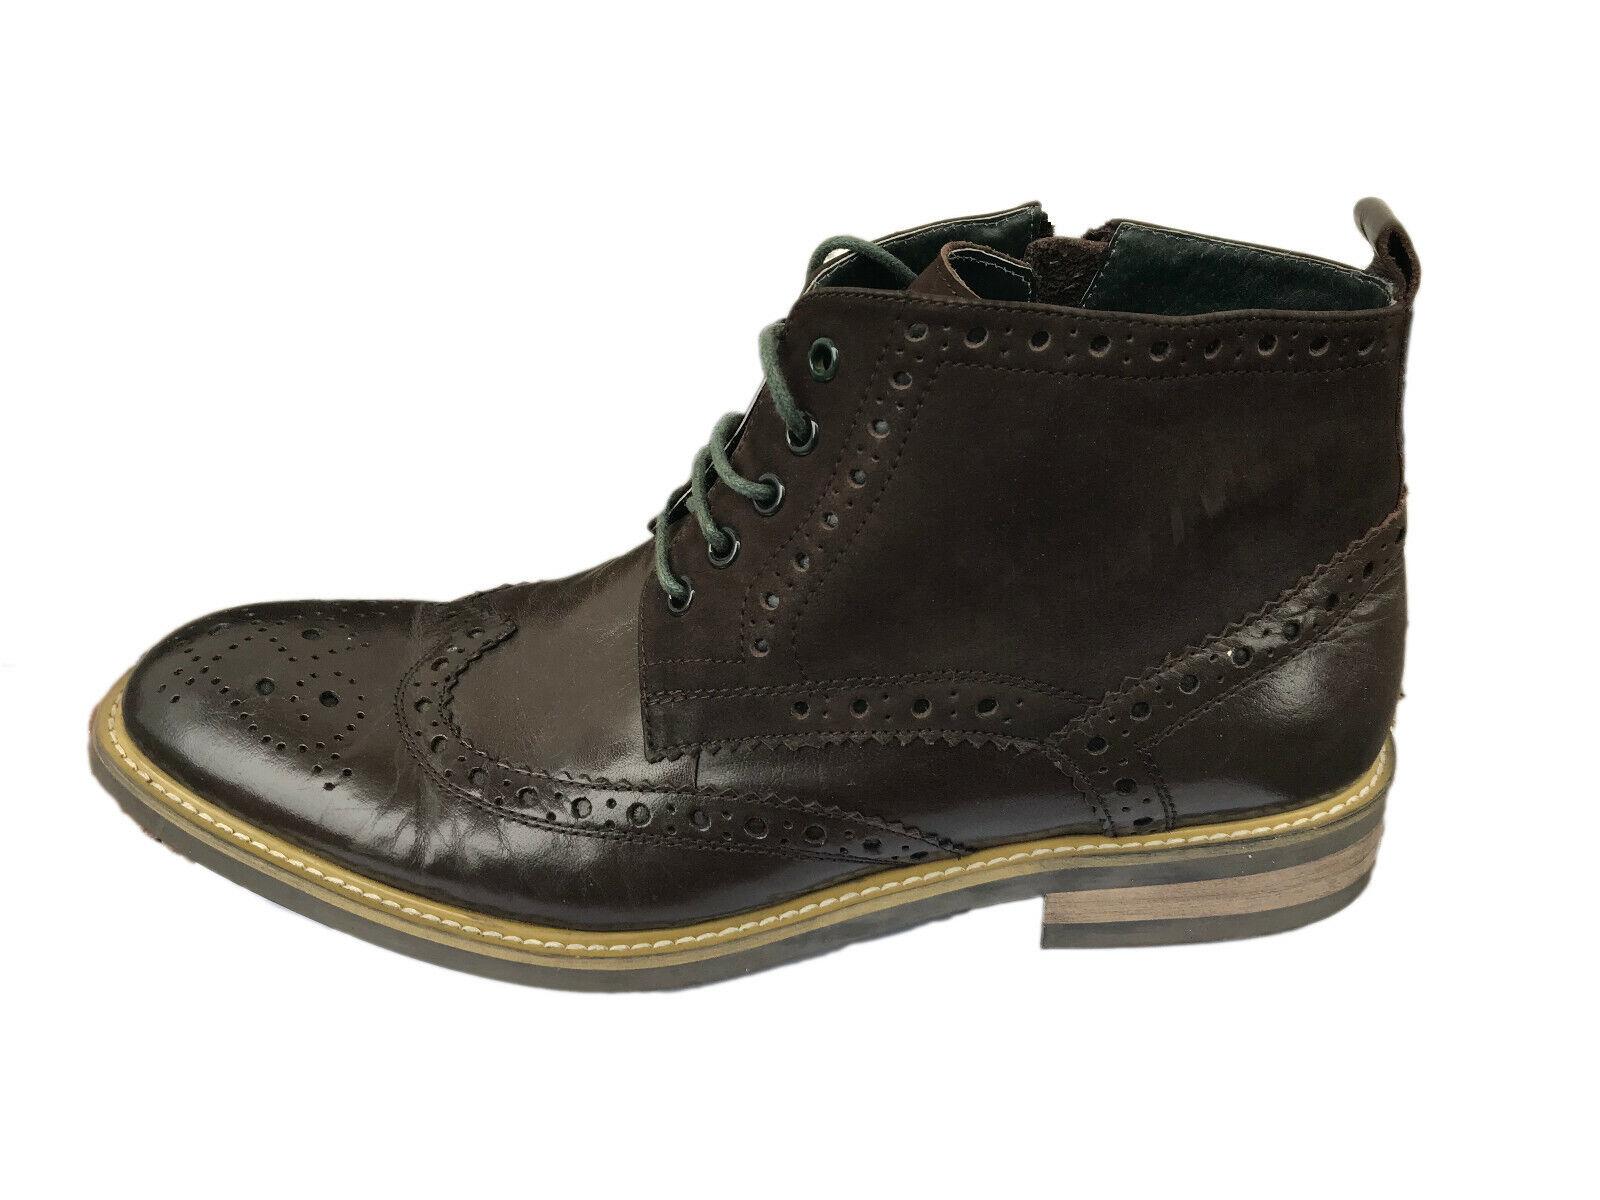 Premium Leather Mens Shoes JUSTIN REECE MATTHEW Boots Brogues UK 12-12.5 EU 48